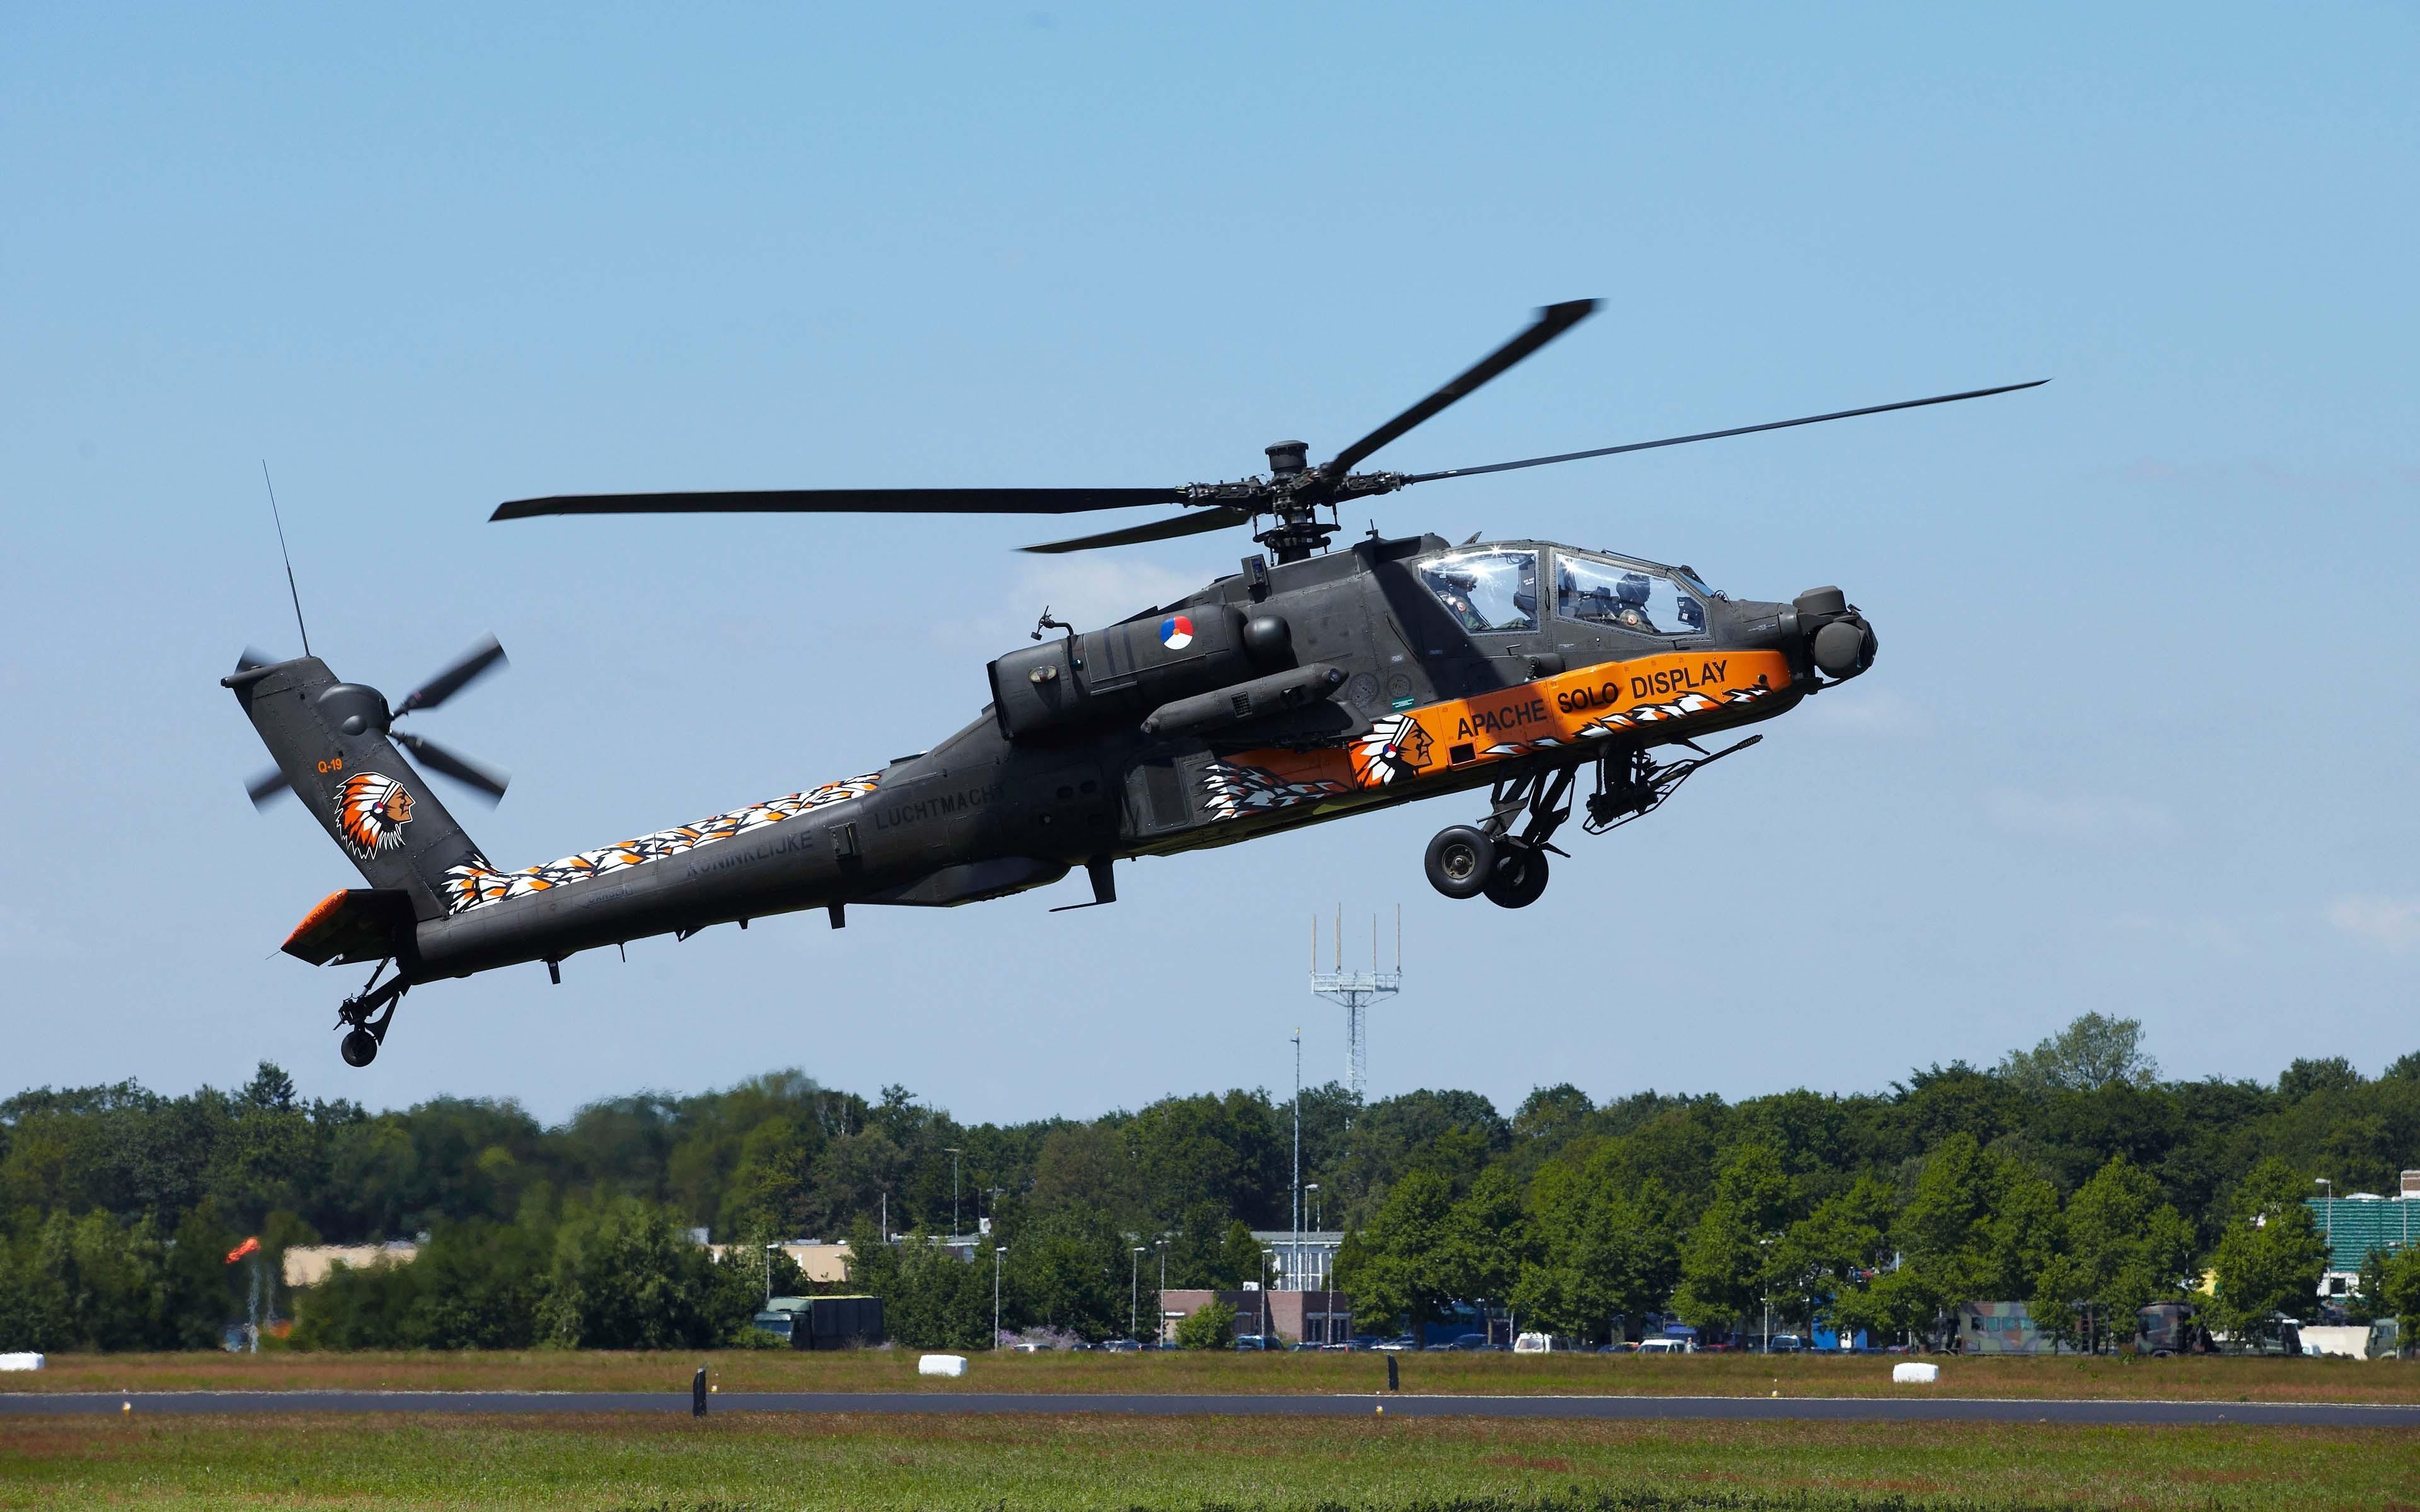 Military Helicopter 4k Hd Desktop Wallpaper For 4k Ultra: Apache AH-64 4k Ultra HD Wallpaper